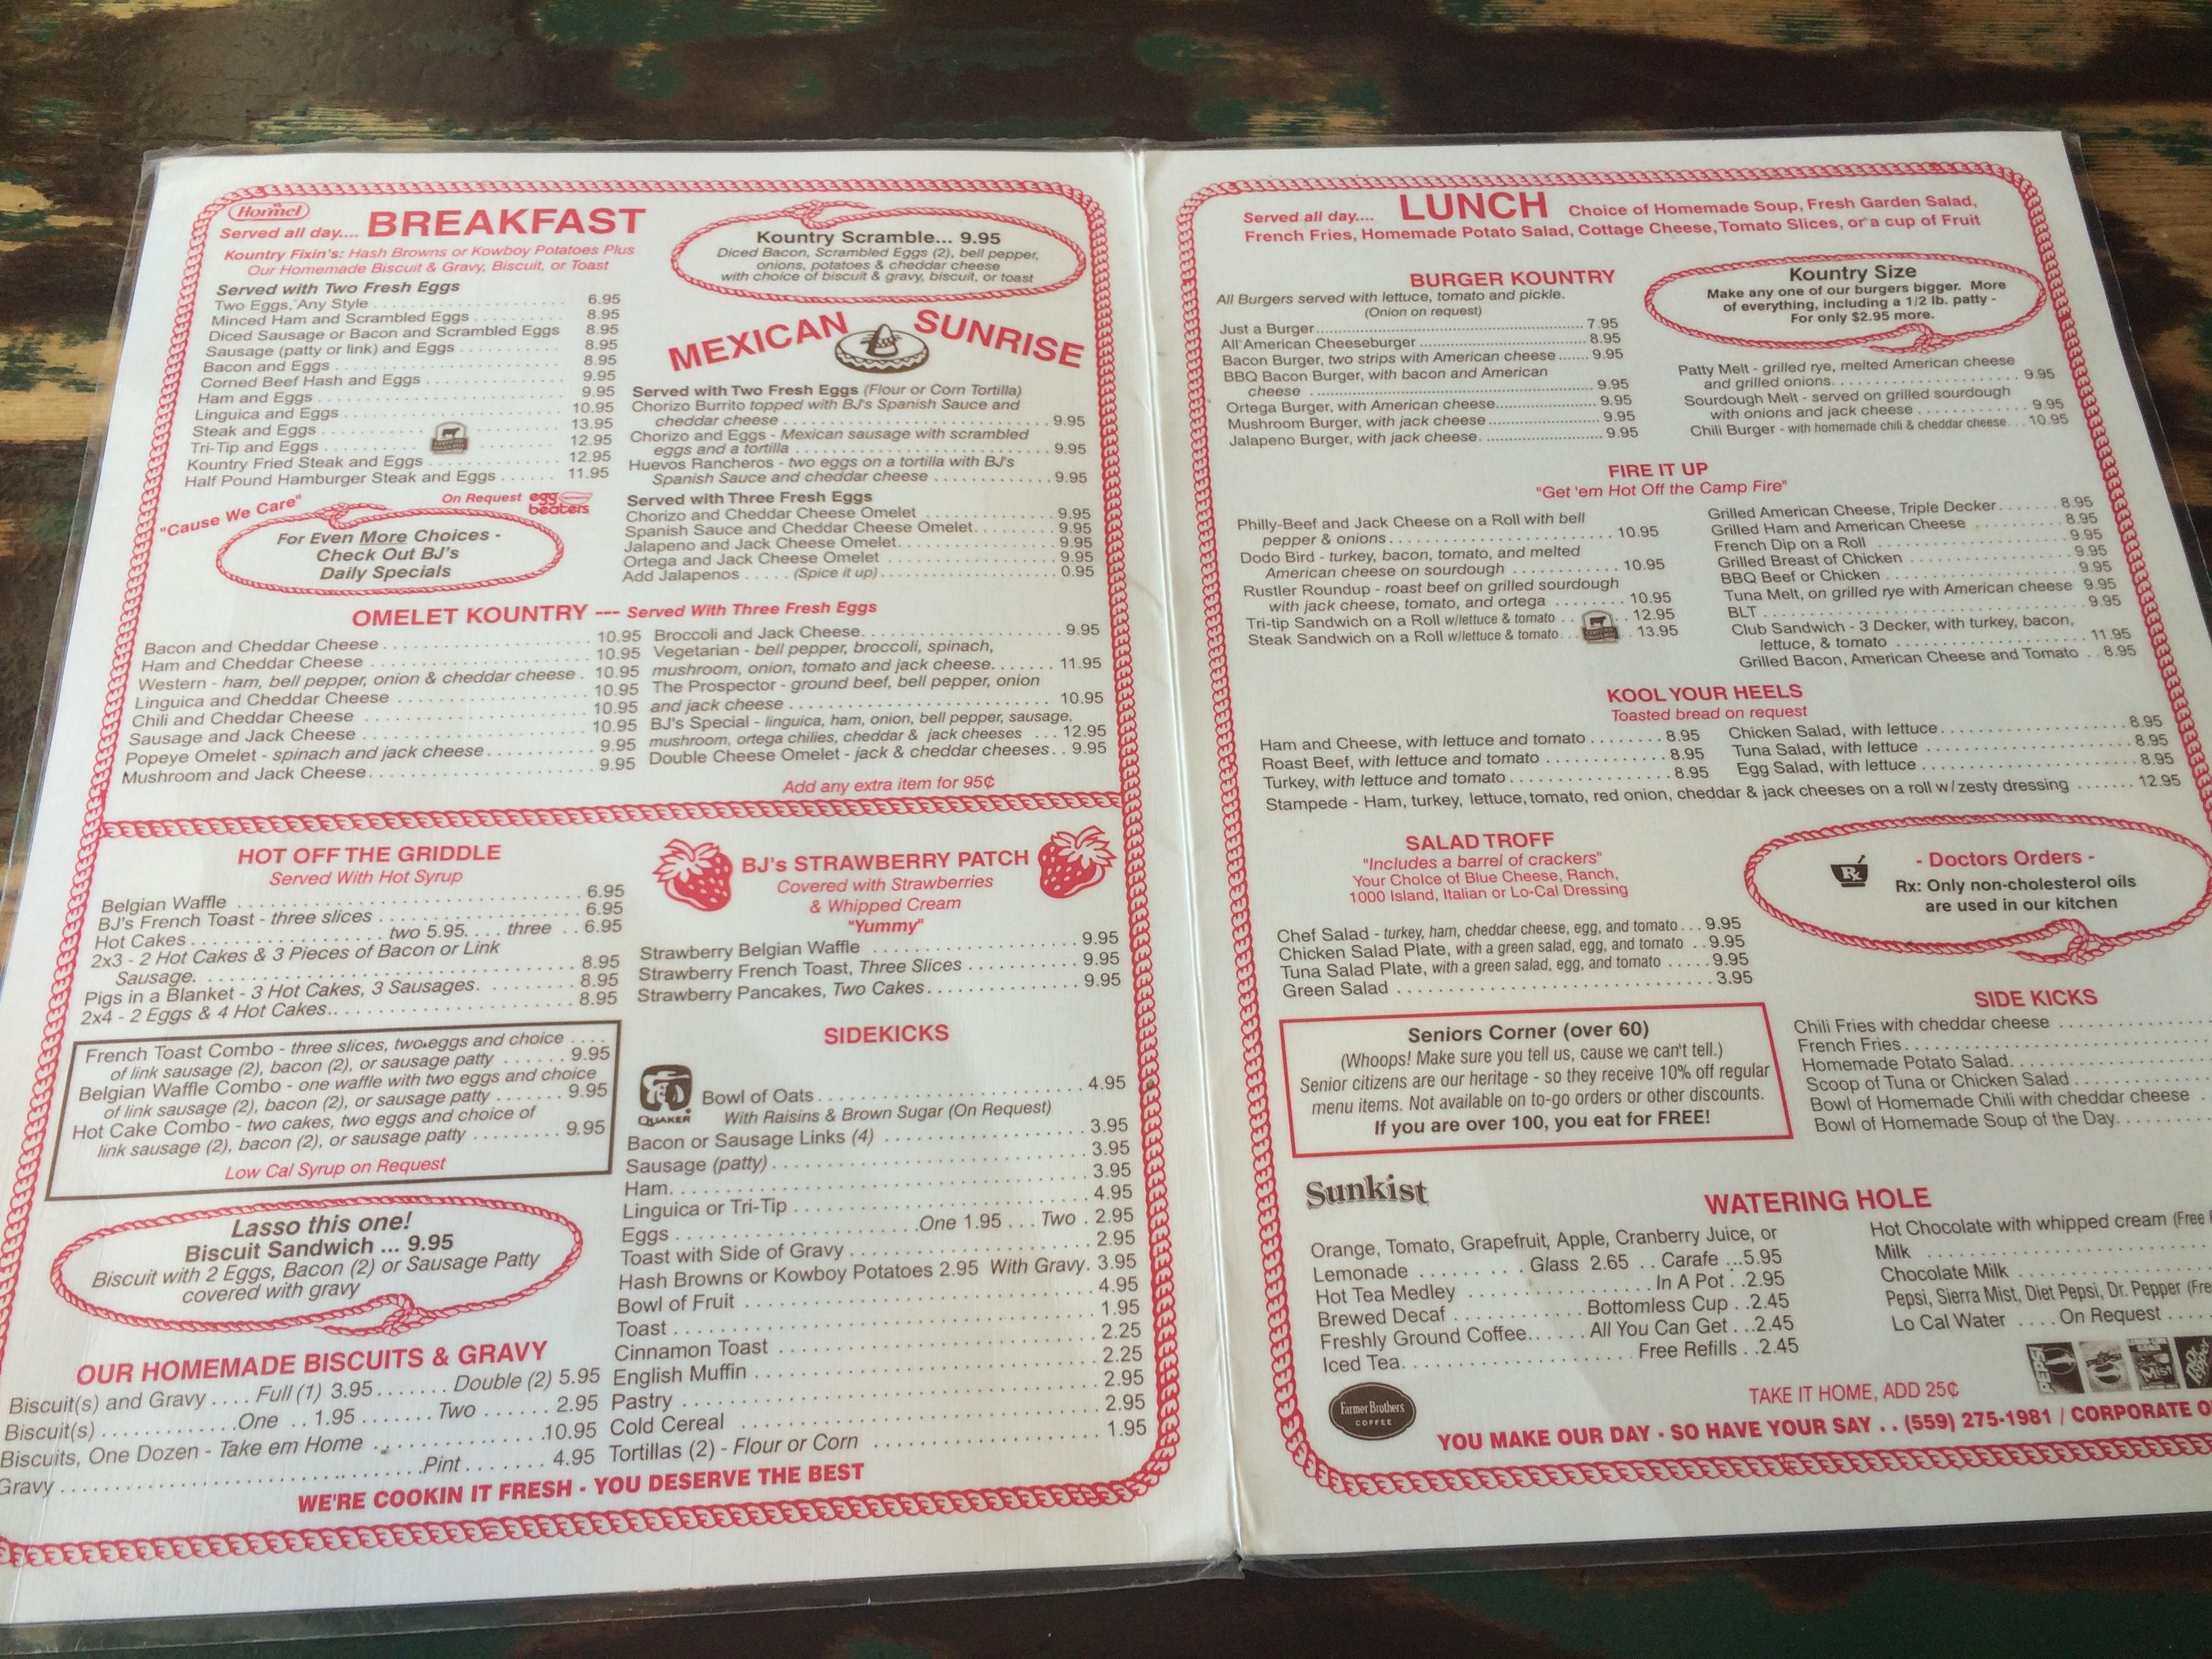 The menu at BJ's Kountry Kitchen